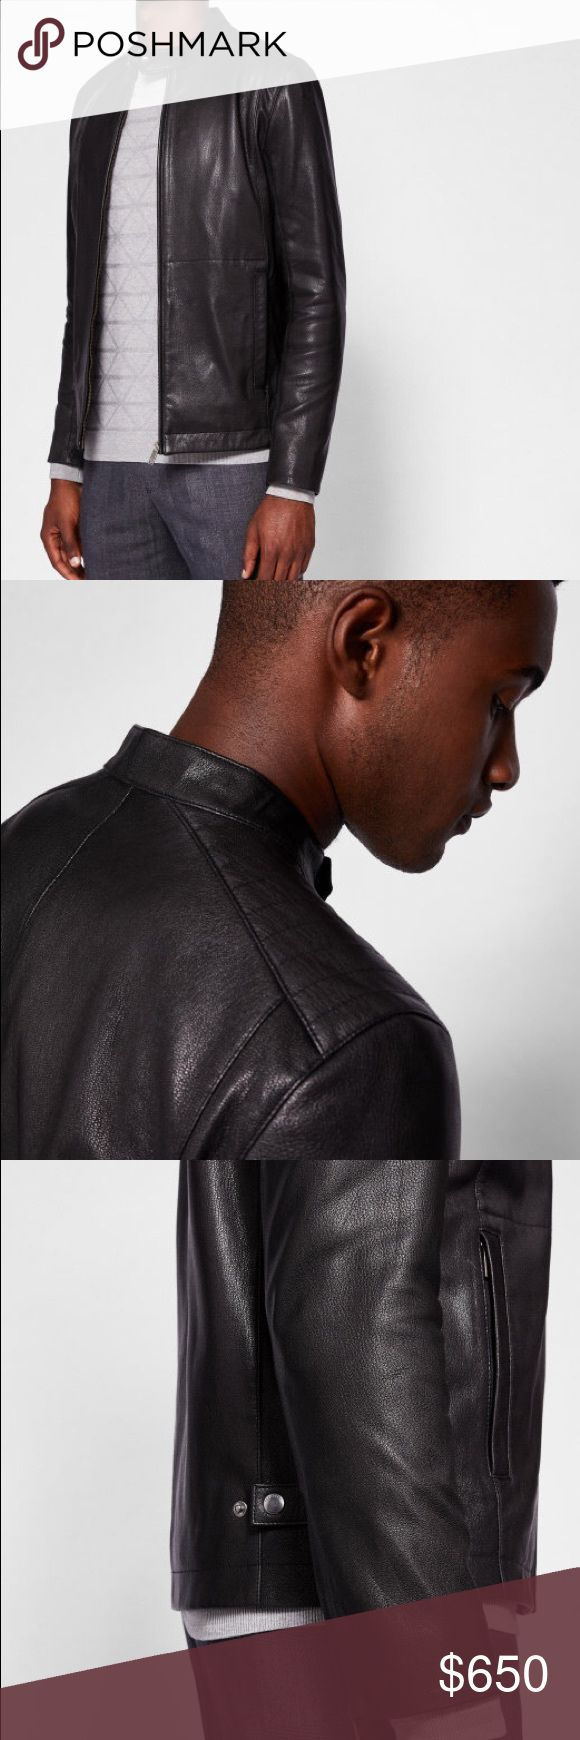 Ted Baker Leather Jacket Ted Baker Leather Jacket    Size 3   Never worn Ted Baker Jackets & Coats